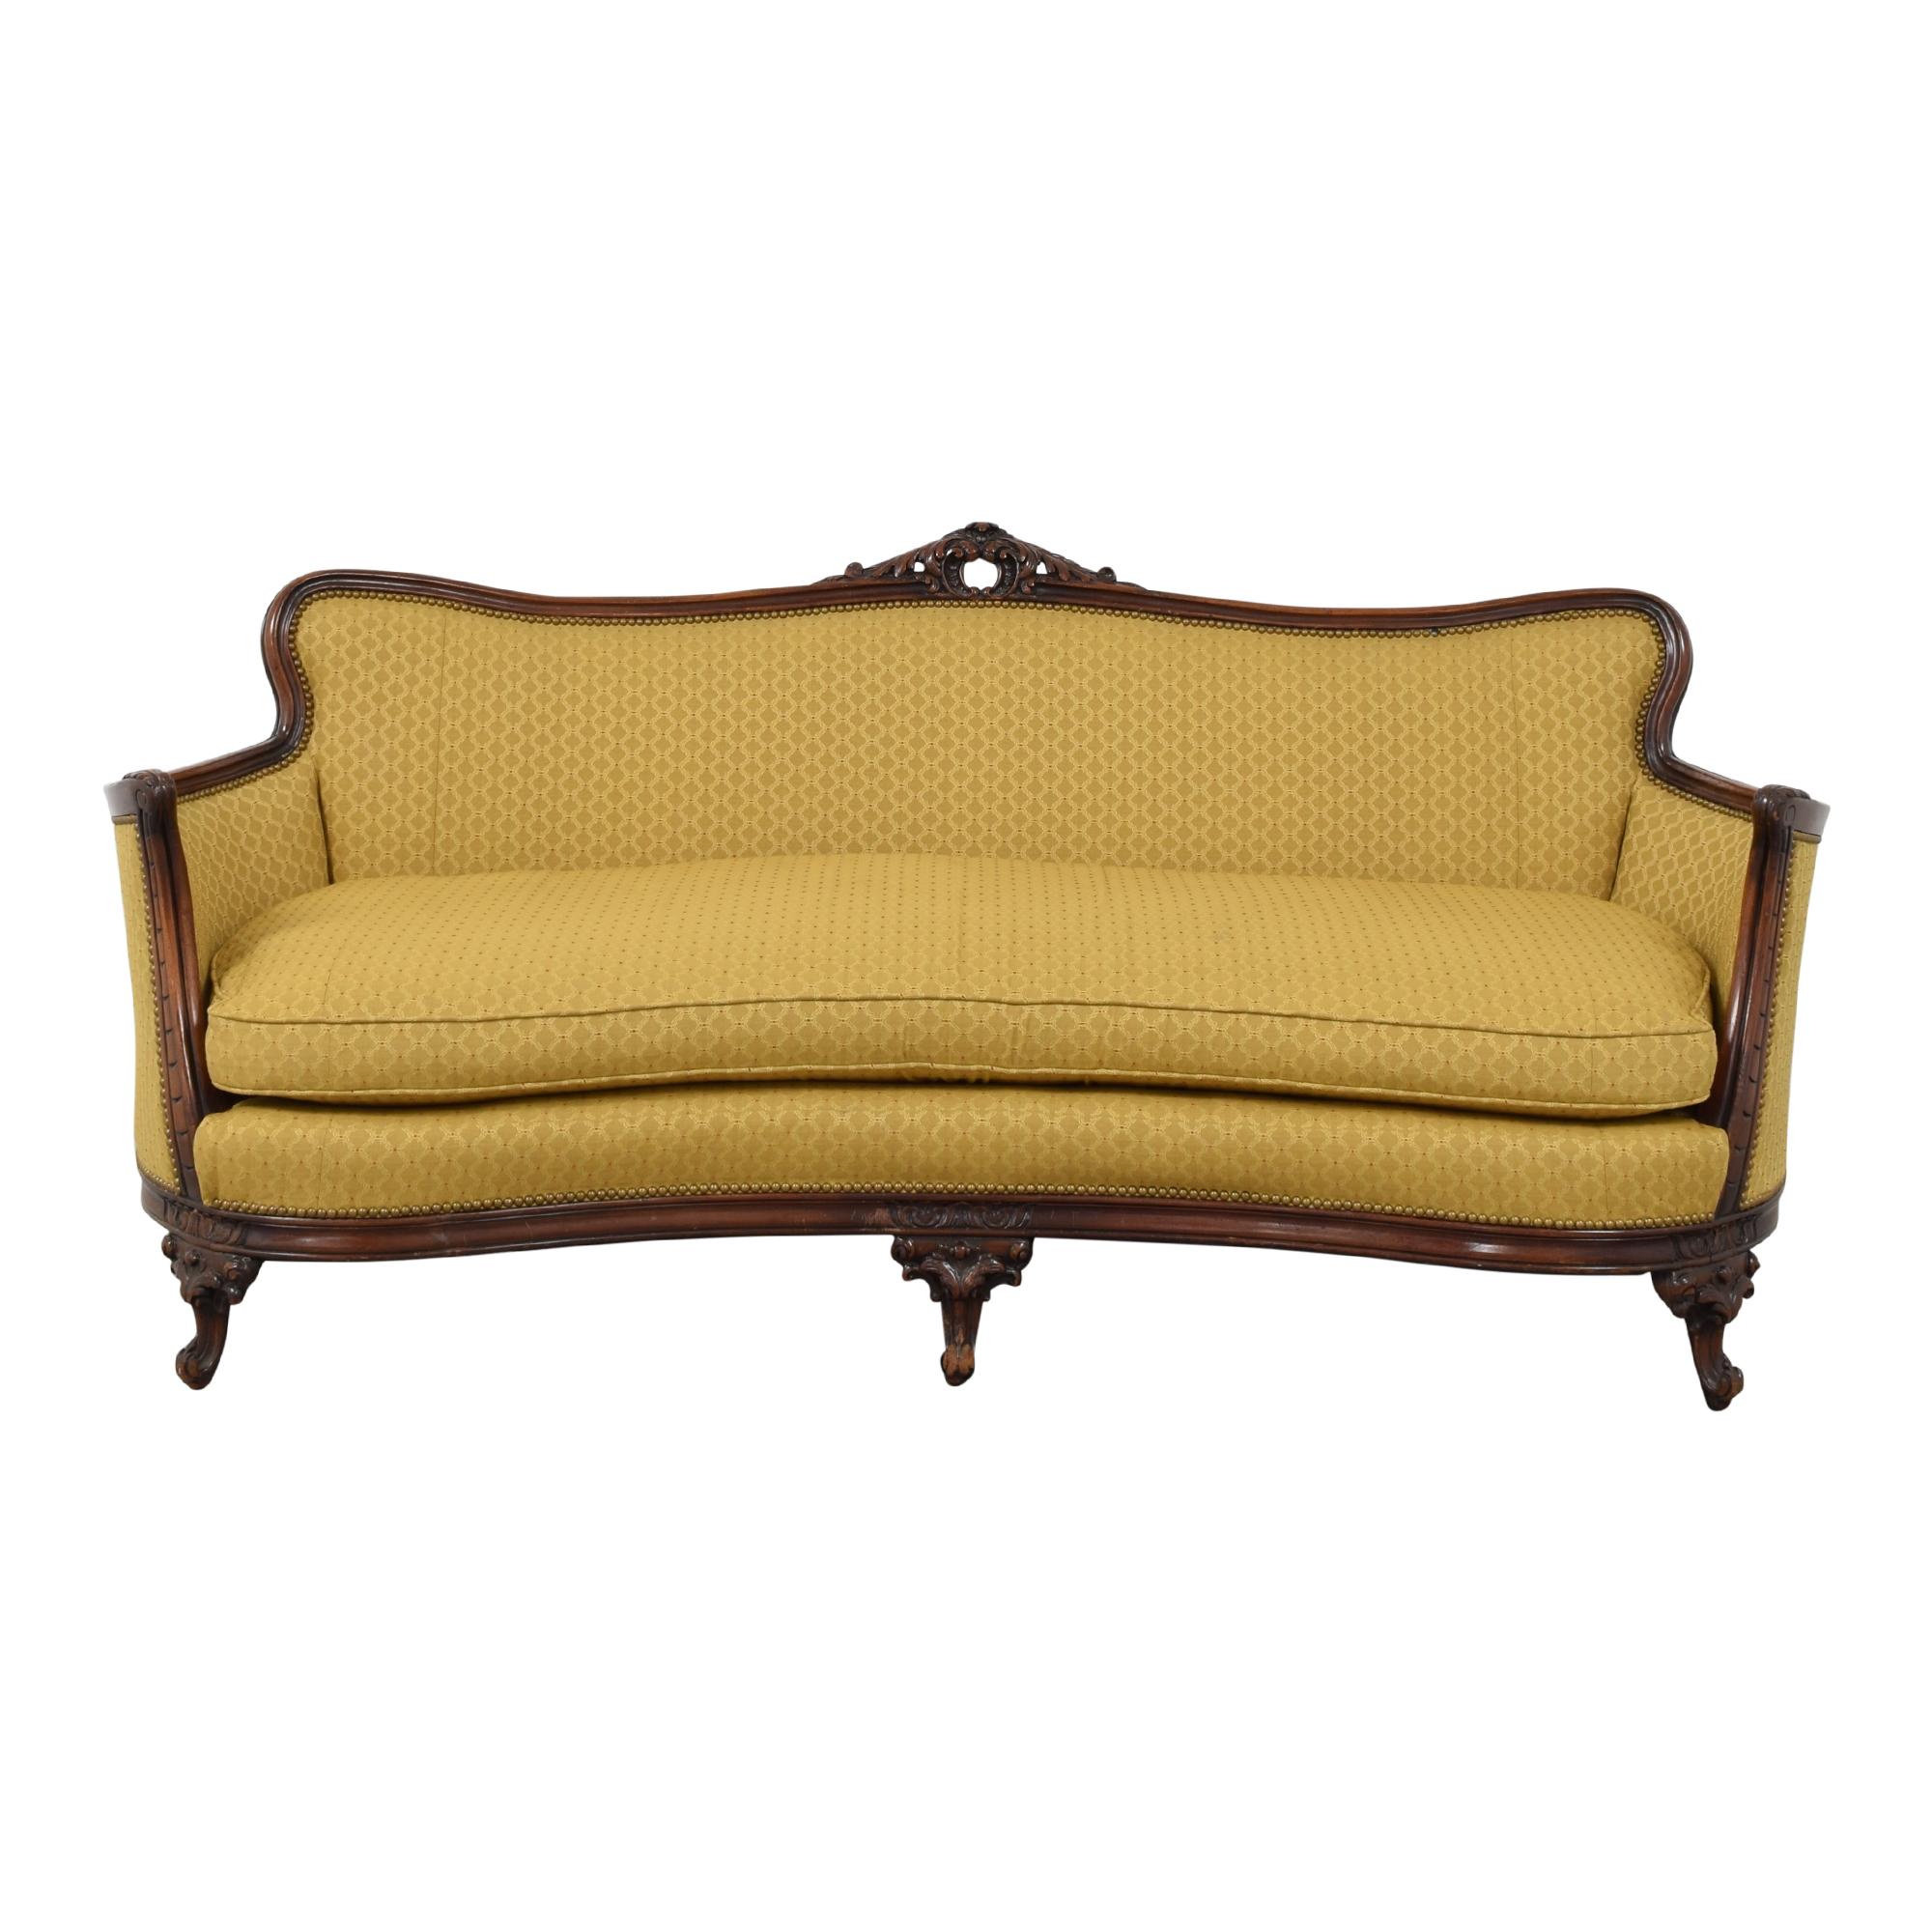 Vintage-Style Bench Cushion Sofa used